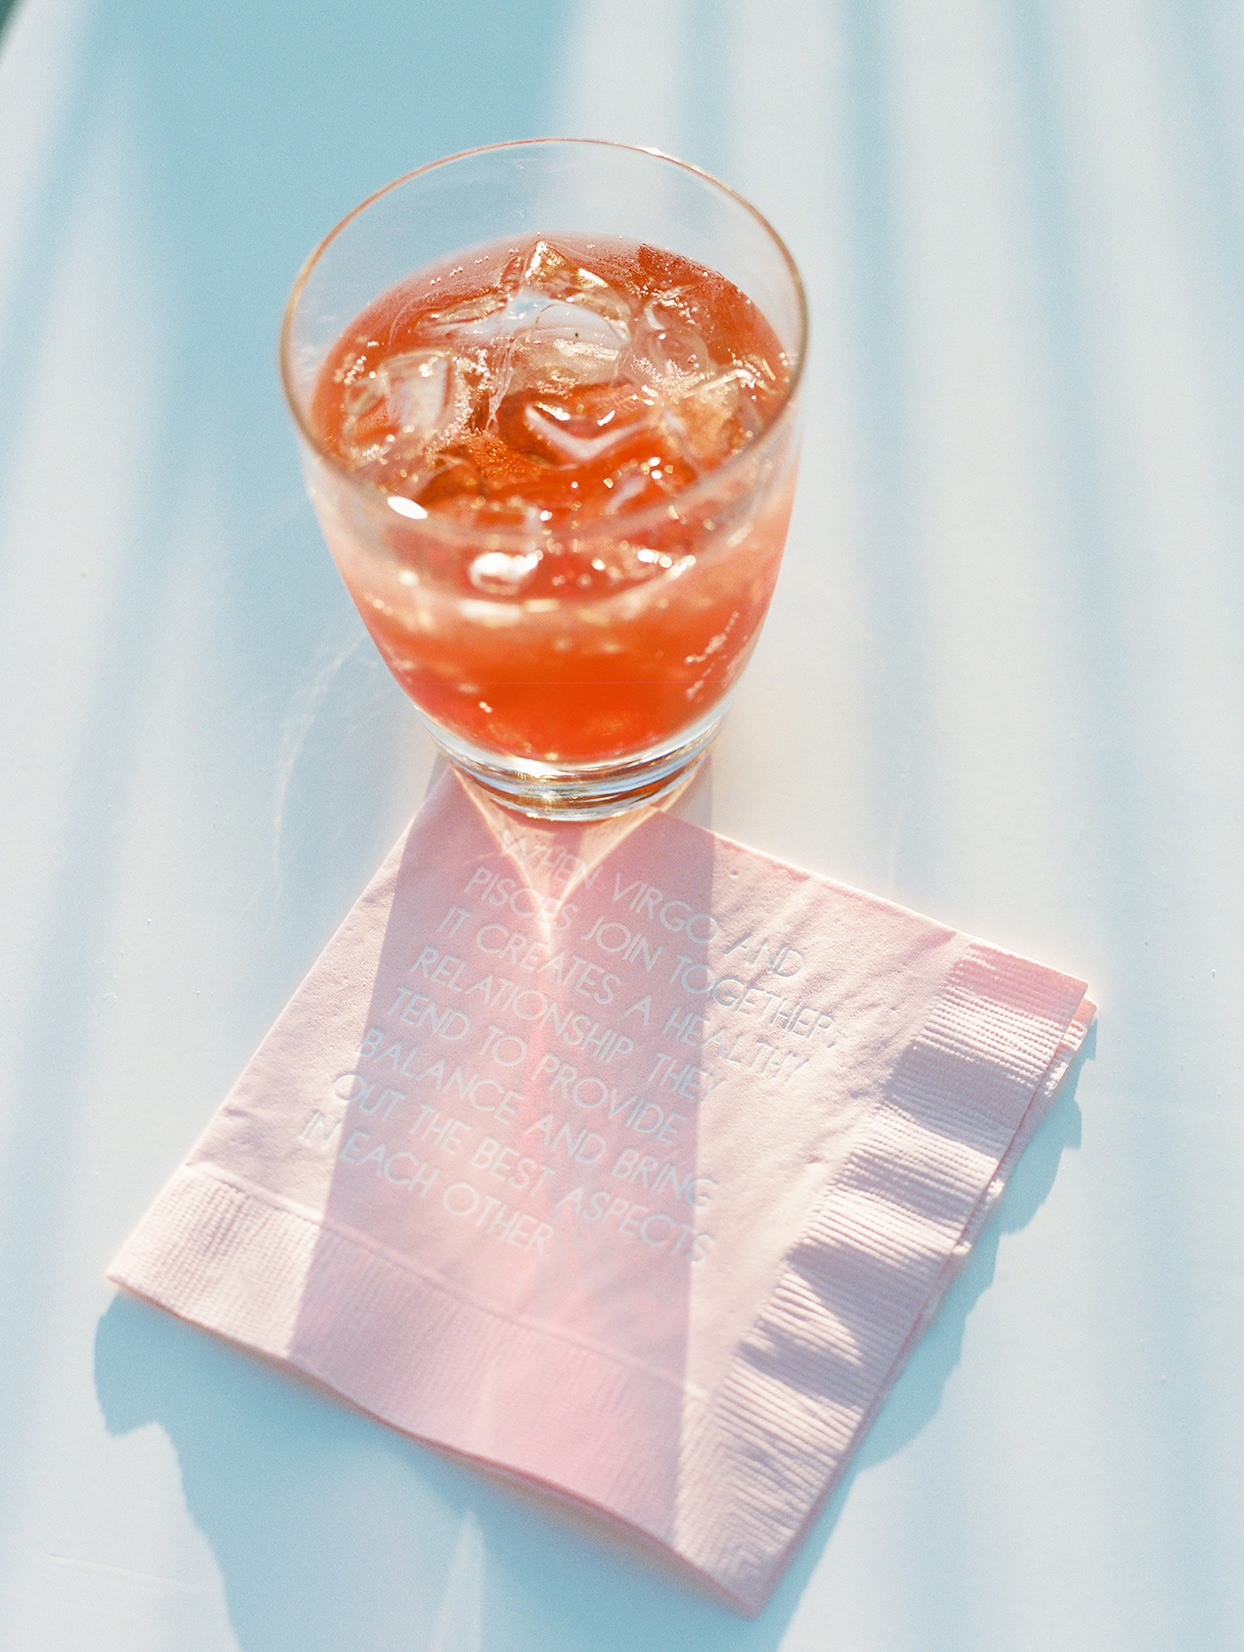 katie nick wedding cocktail glass and napkin